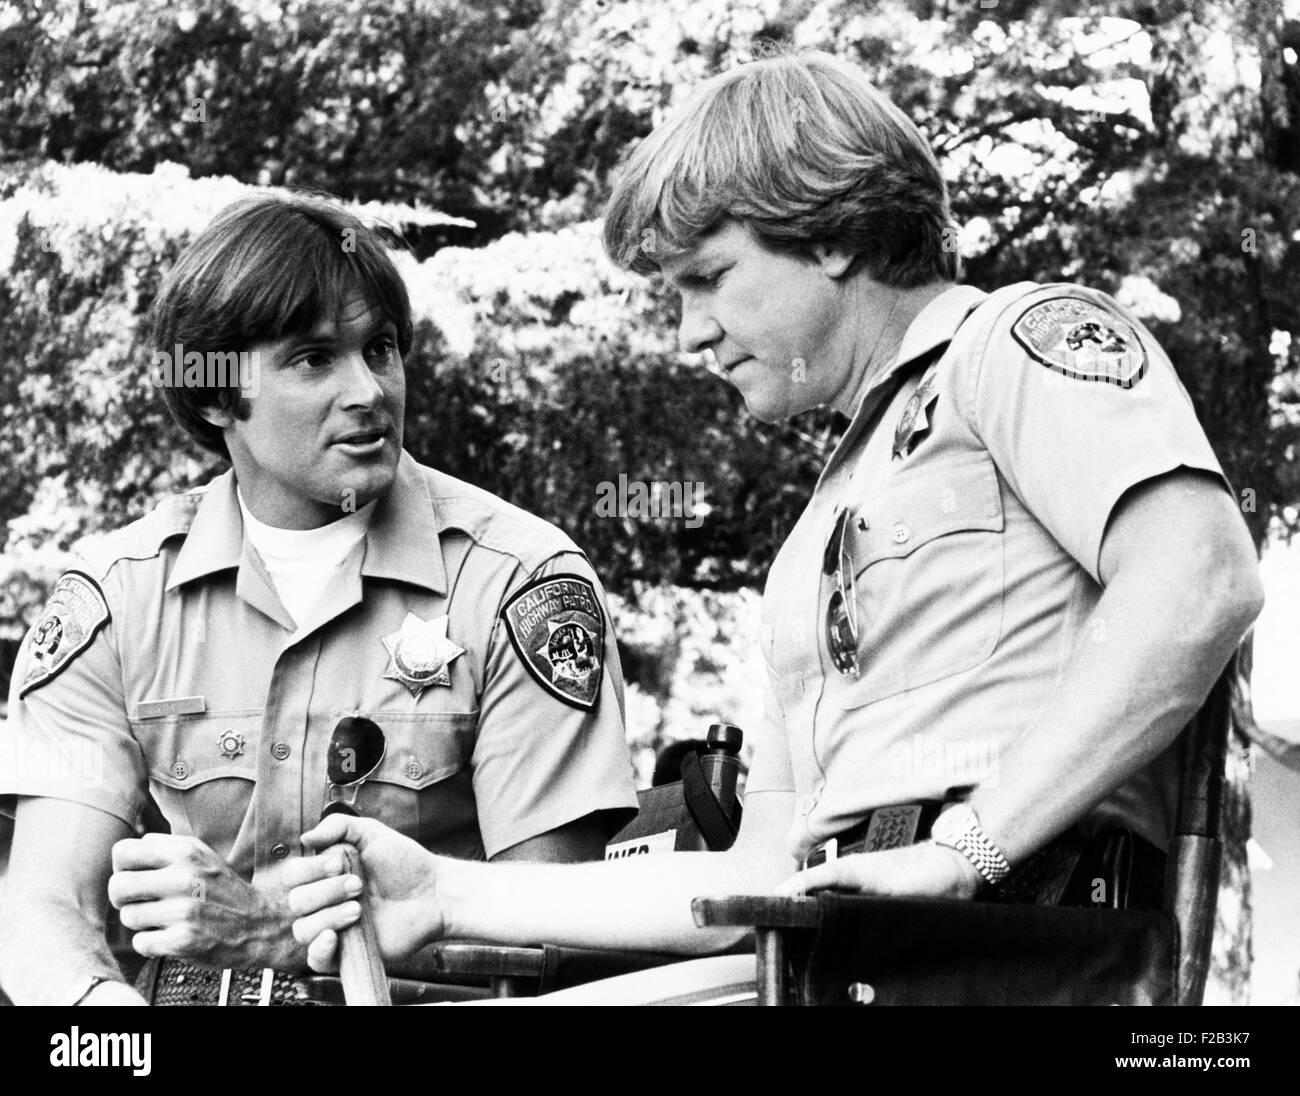 Bruce Jenner as Officer Steve McLeish and Larry Wilcox as Jon Baker on 'CHiPs'. Jenner guest starred, substituting - Stock Image